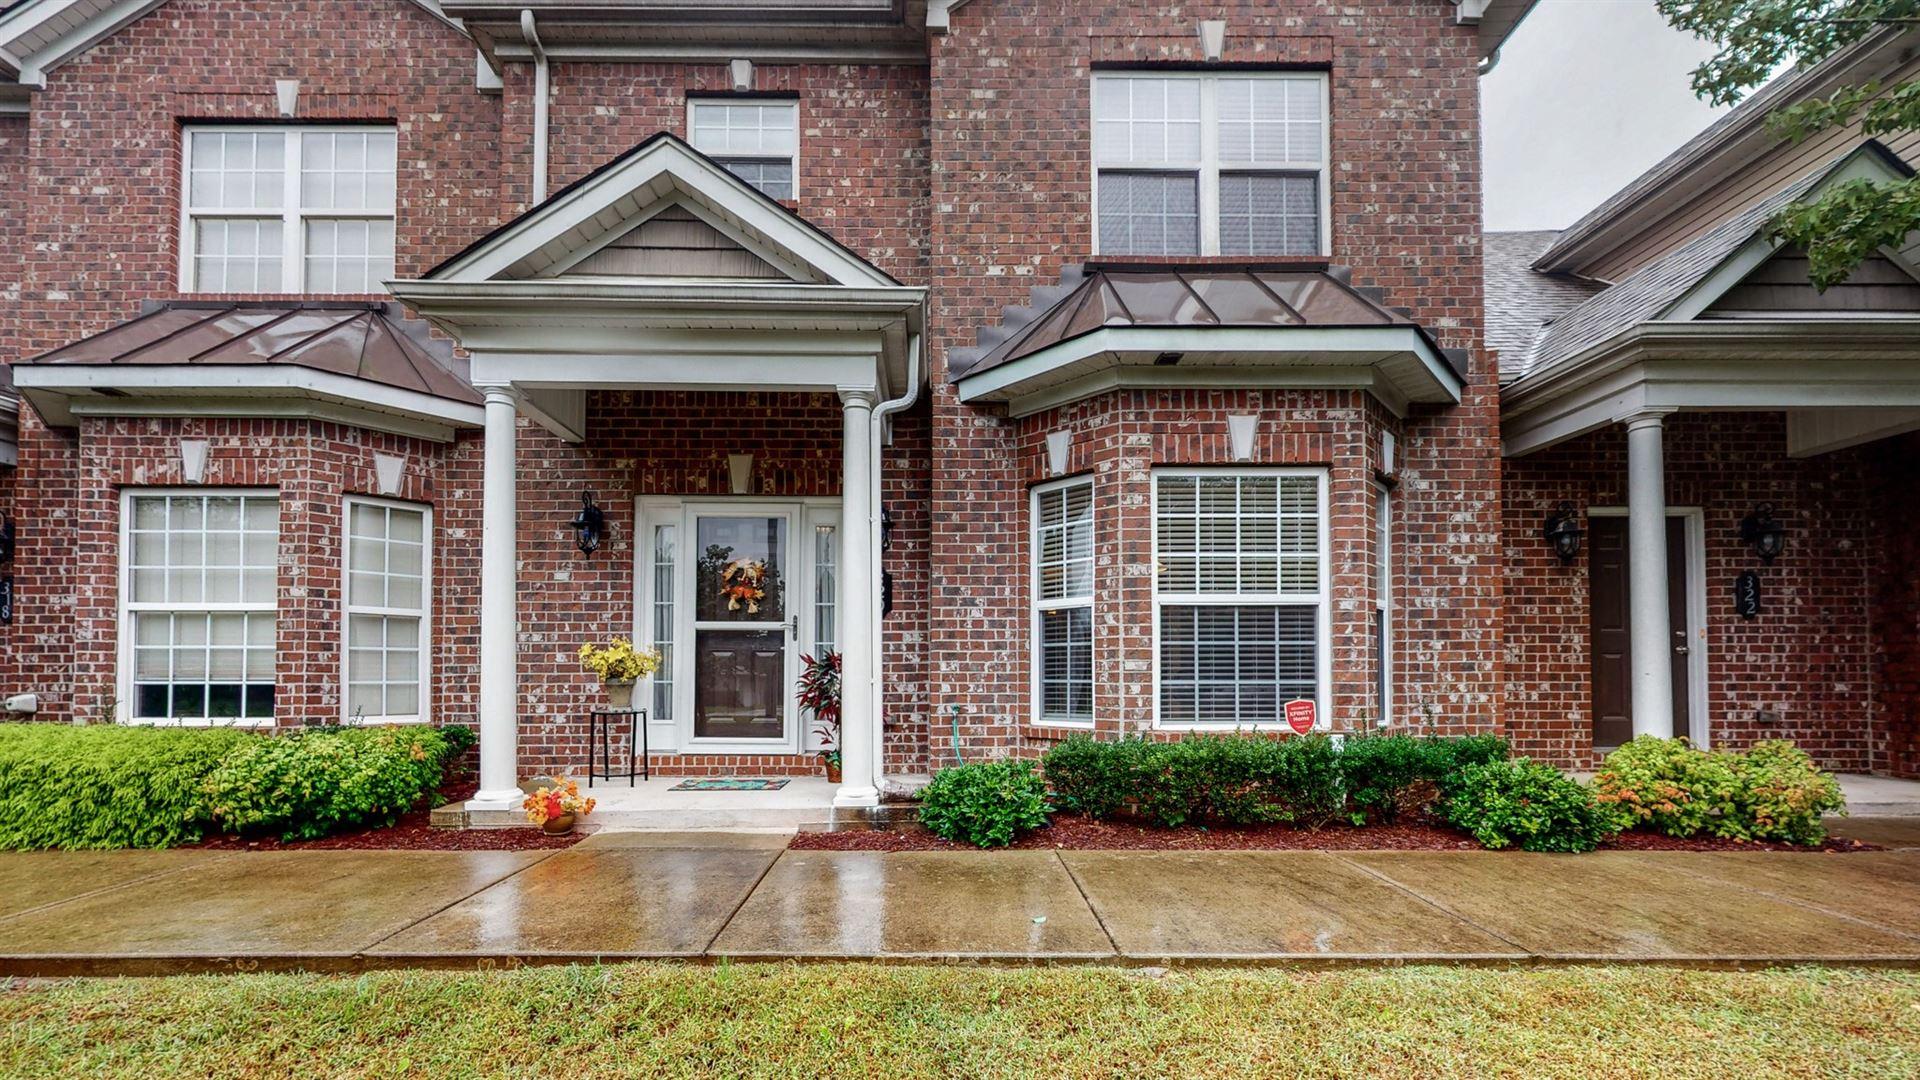 320 Rowlette Cir, Murfreesboro, TN 37127 - MLS#: 2192551